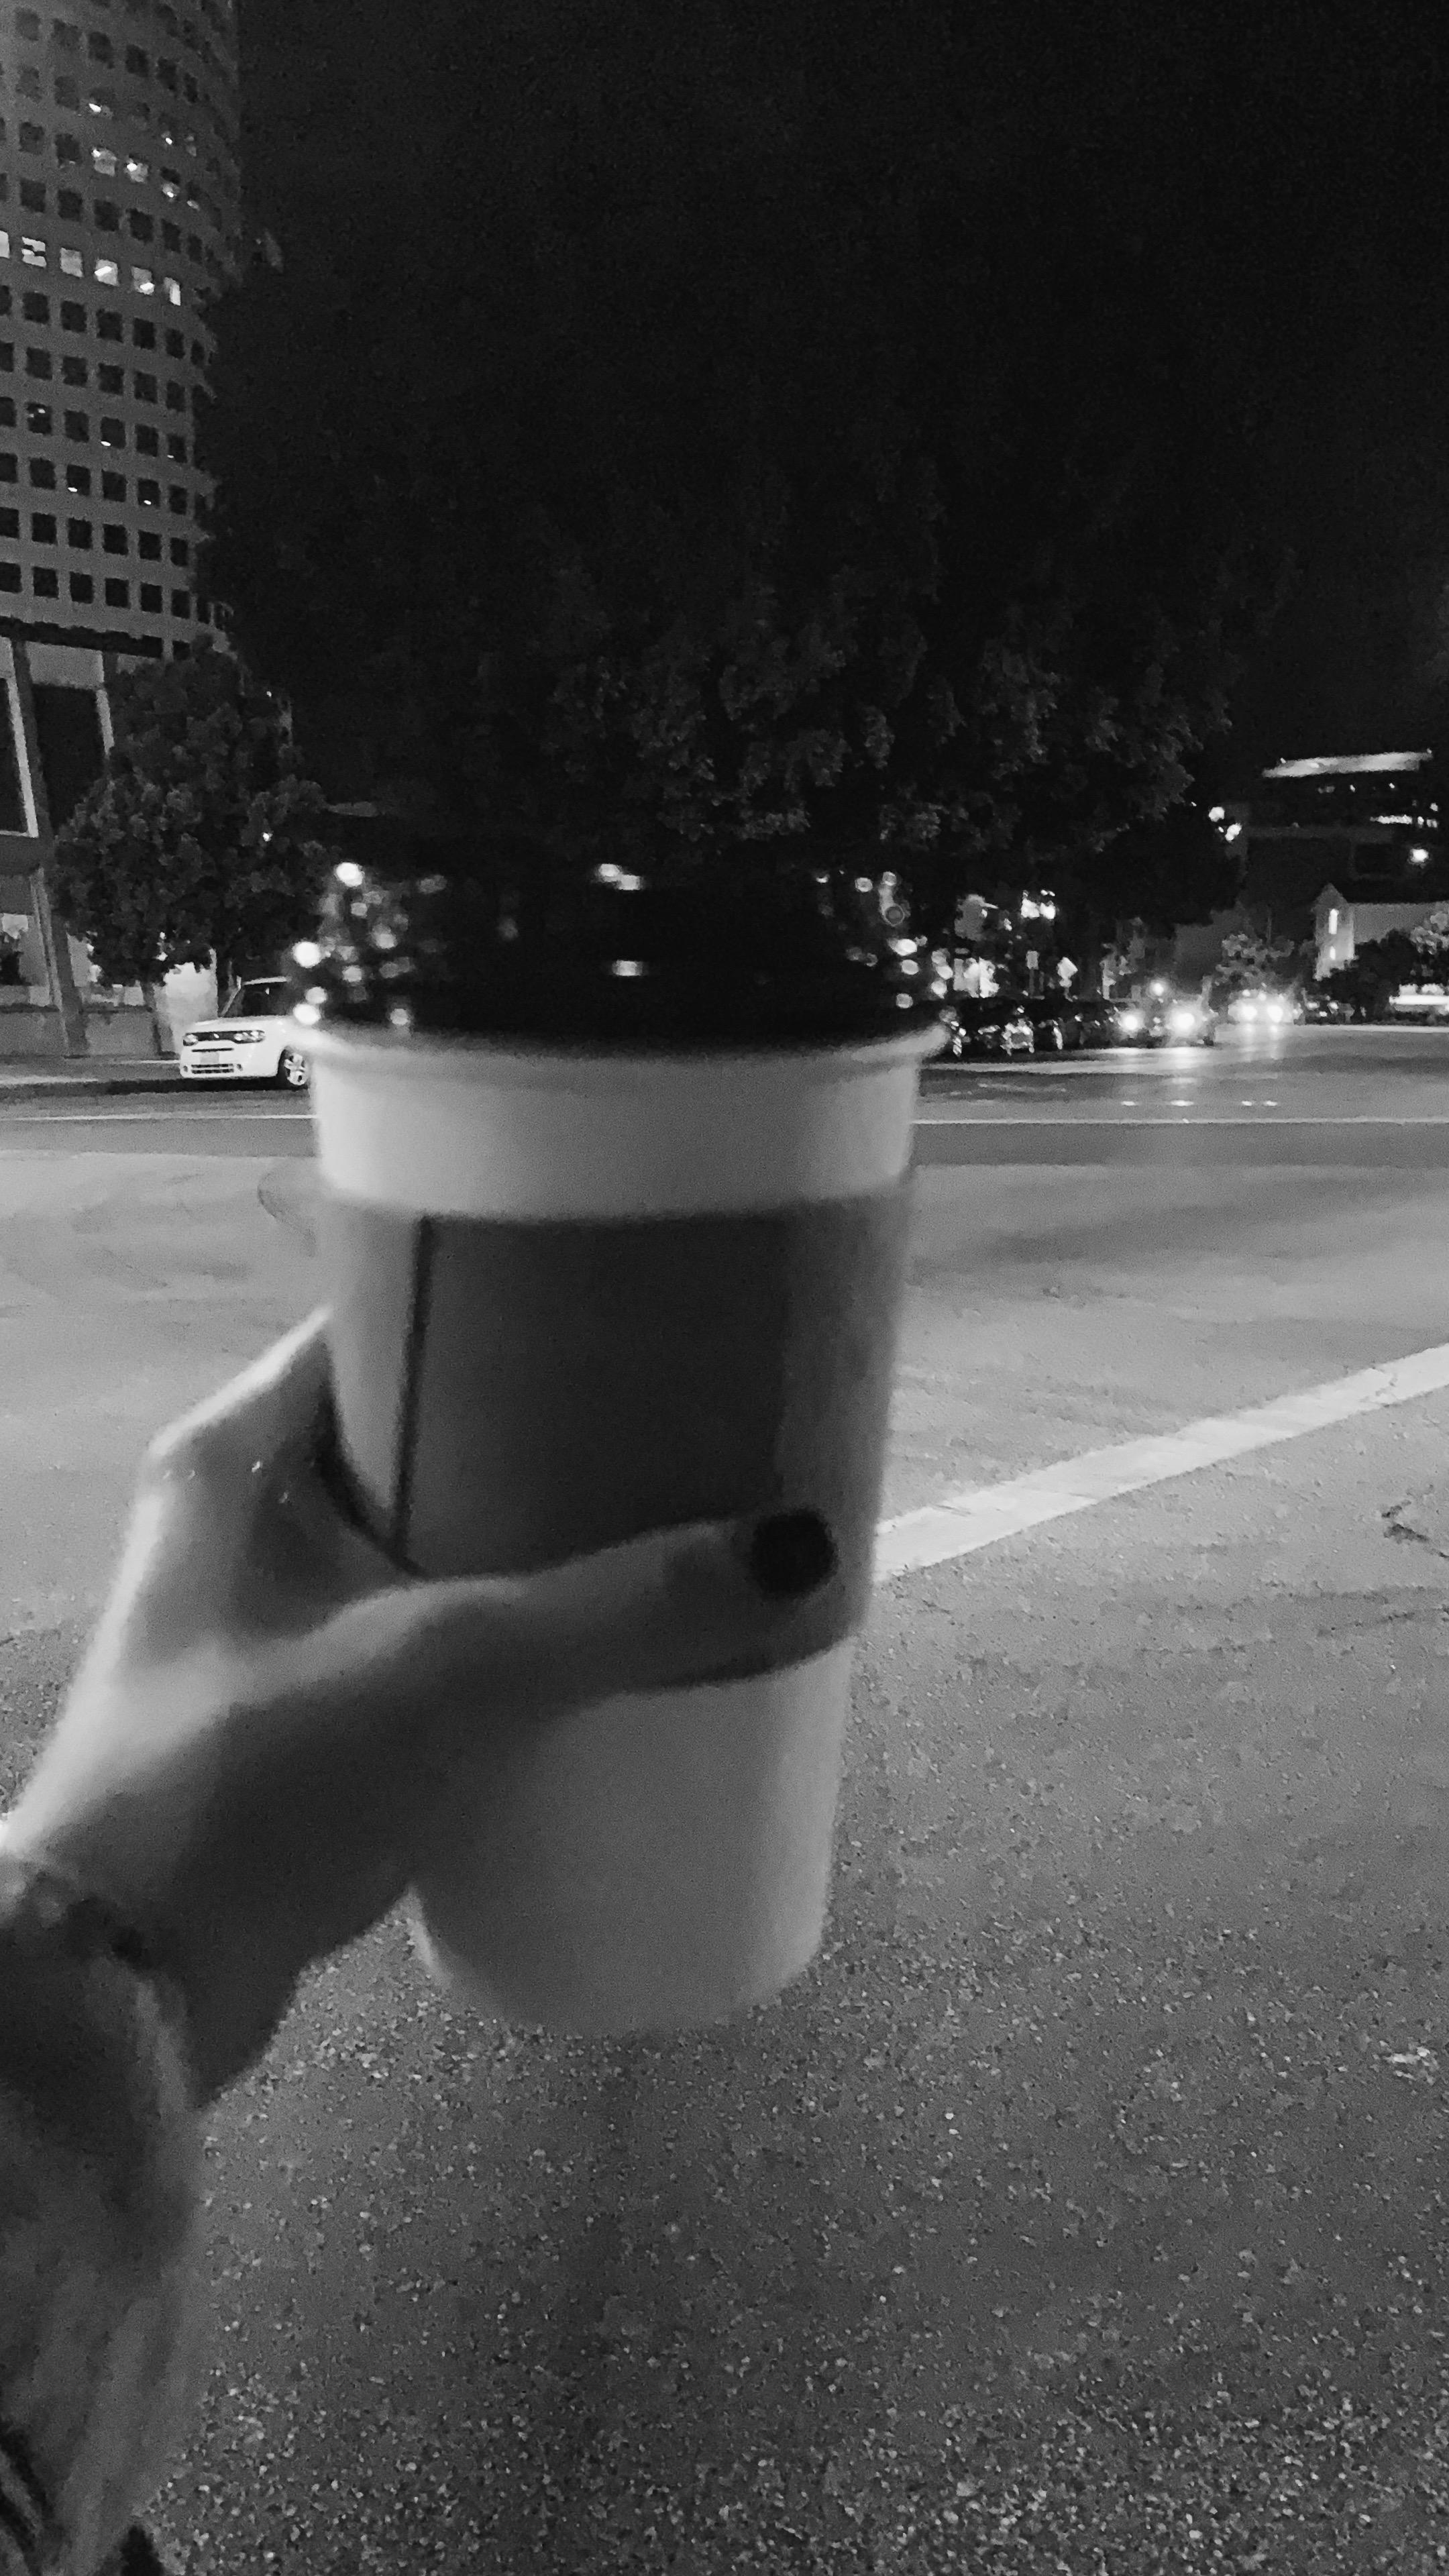 get tea at 12 AM and walk around. -